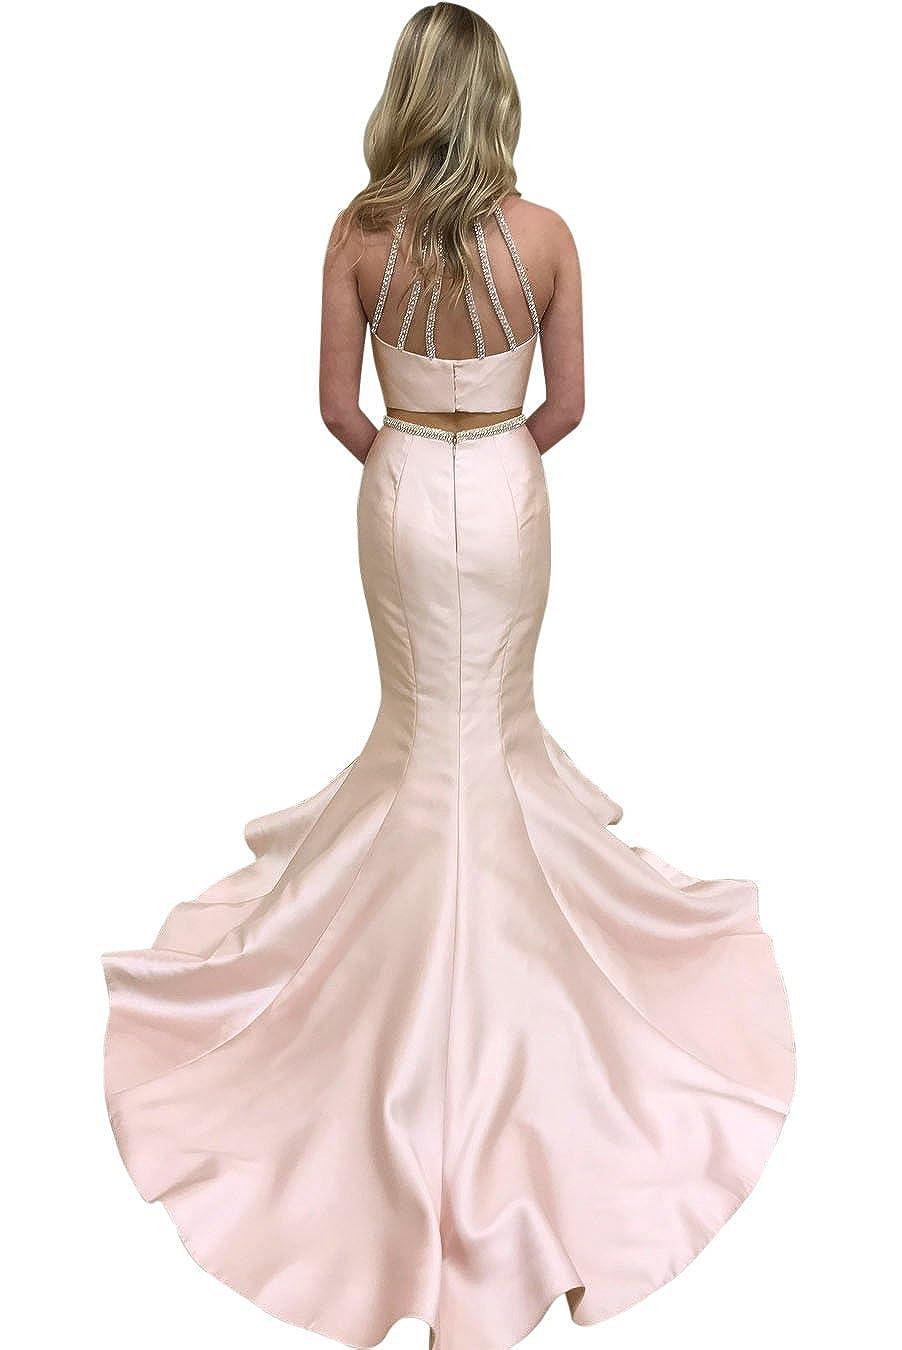 Women High Neck Beaded Sleeveless Two Piece Long Mermaid Satin Prom Dresses Formal